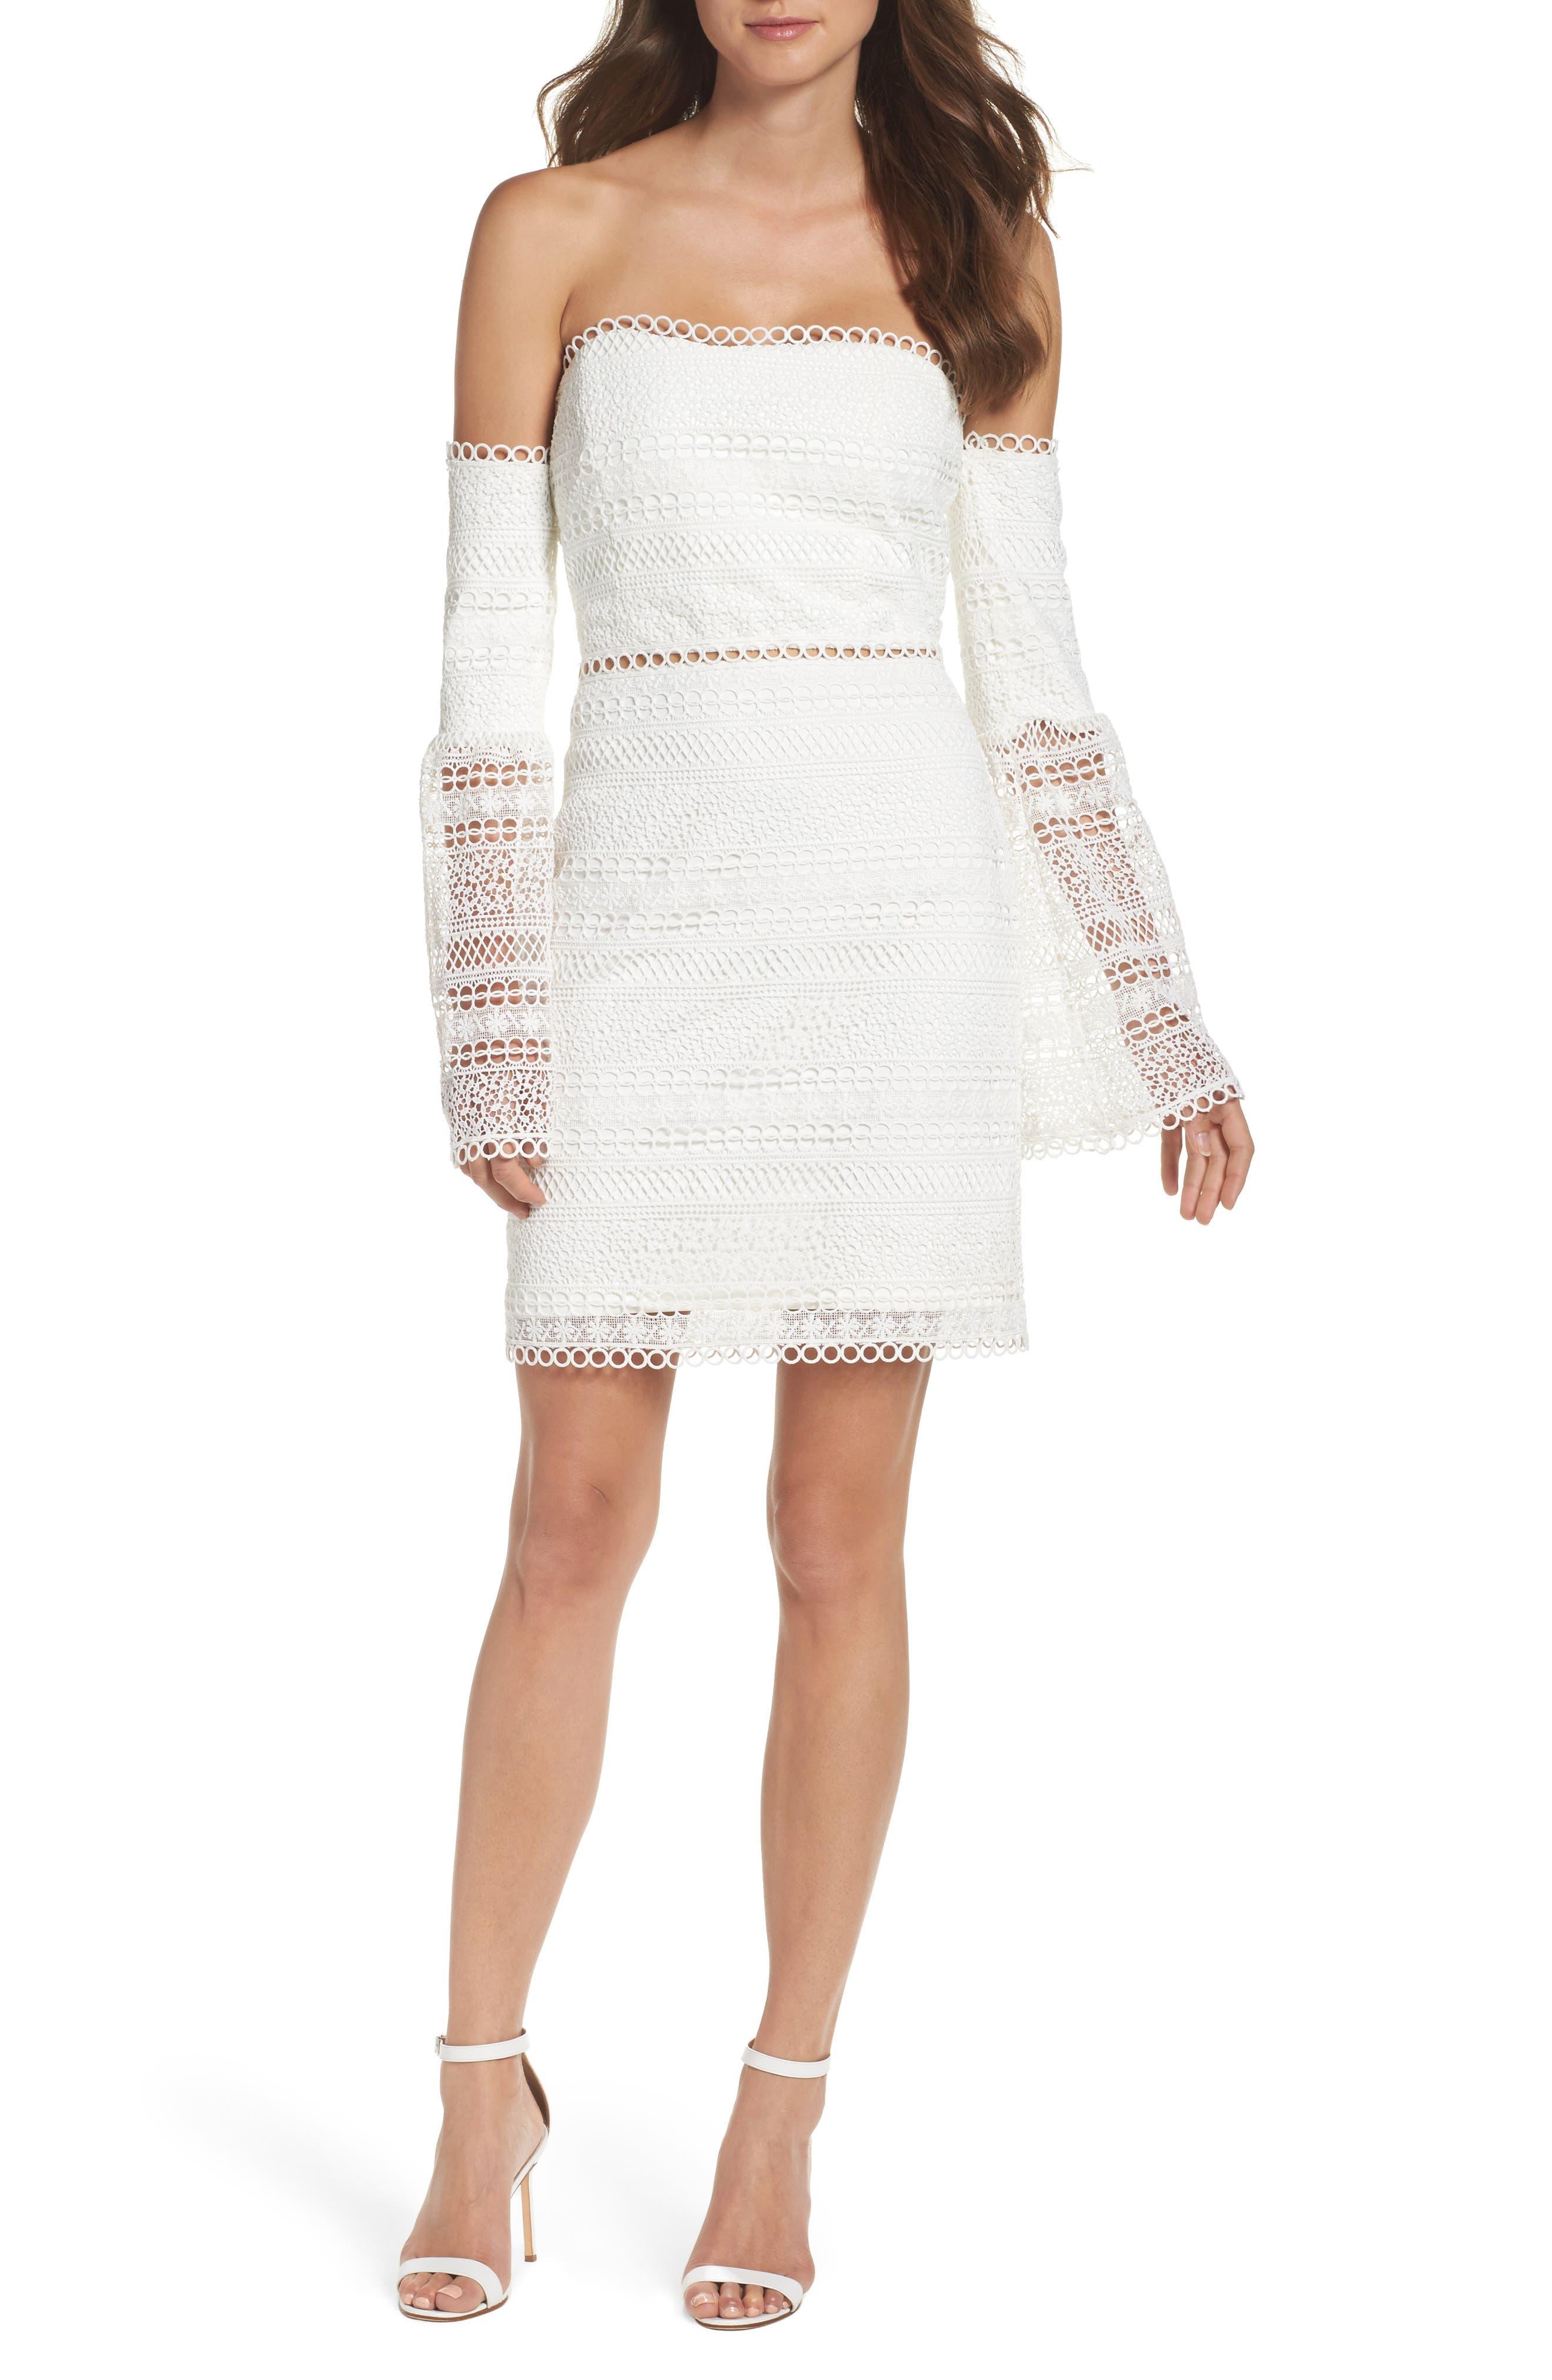 Catalina Lace Off the Shoulder Sheath Dress,                             Main thumbnail 1, color,                             100